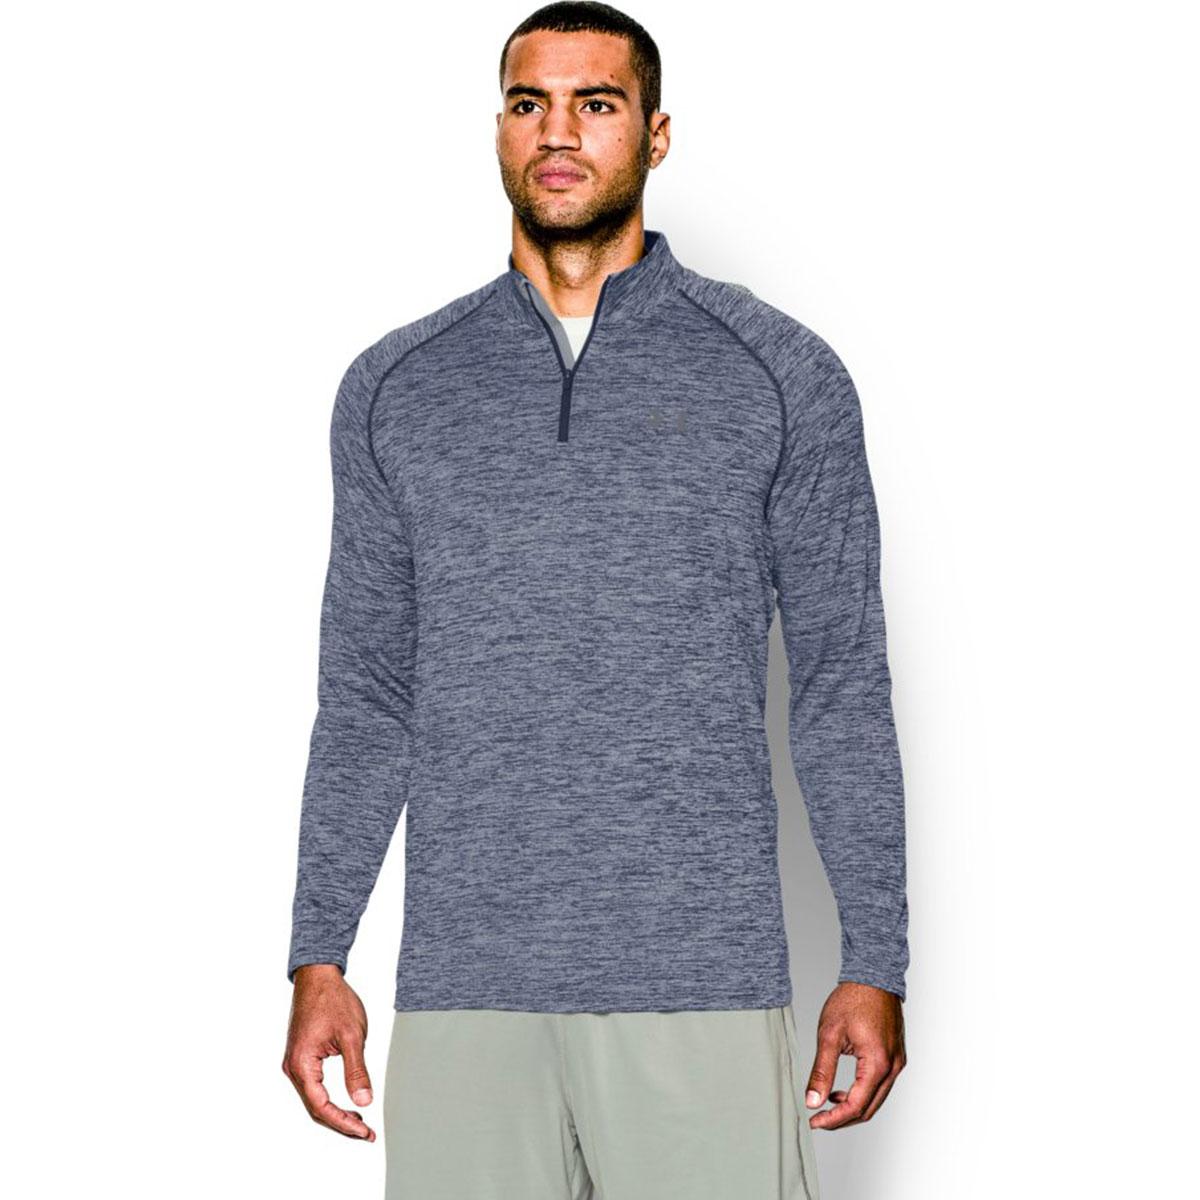 Under-Armour-Mens-UA-Tech-1-4-Zip-Long-Sleeve-Top-Gym-Shirt-Workout-Layer